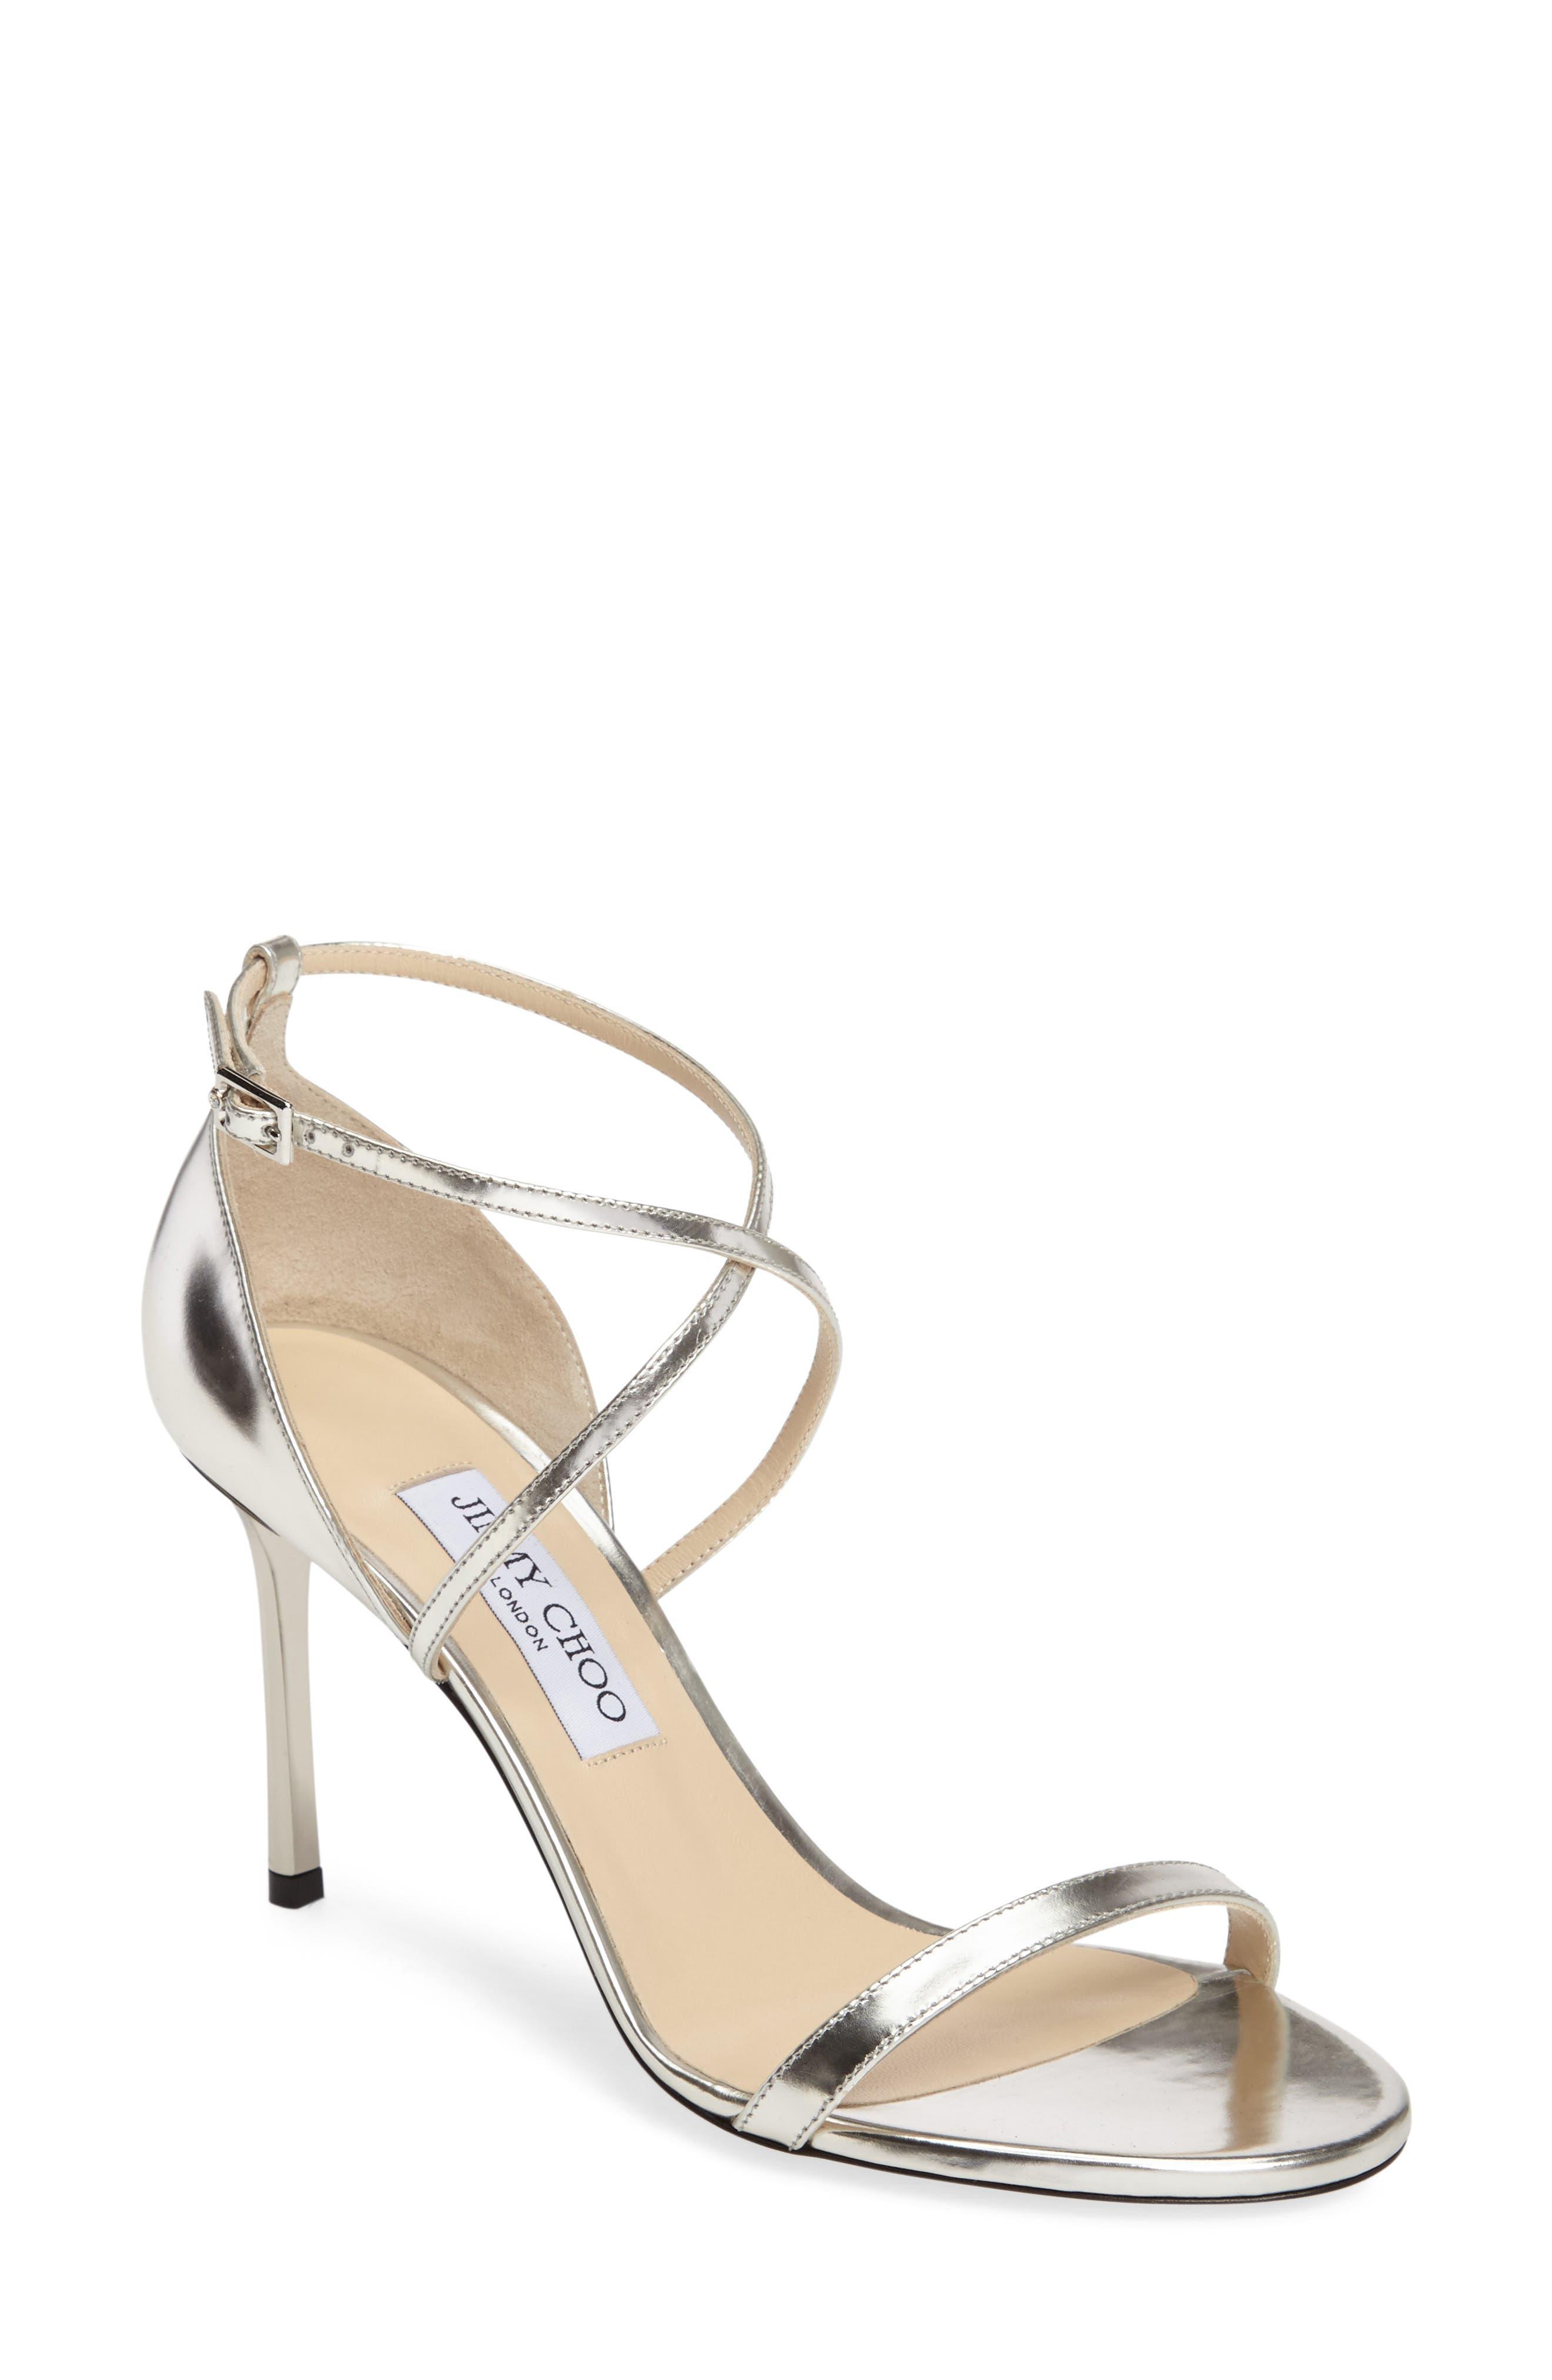 'Hesper' Ankle Strap Sandal,                             Main thumbnail 1, color,                             040